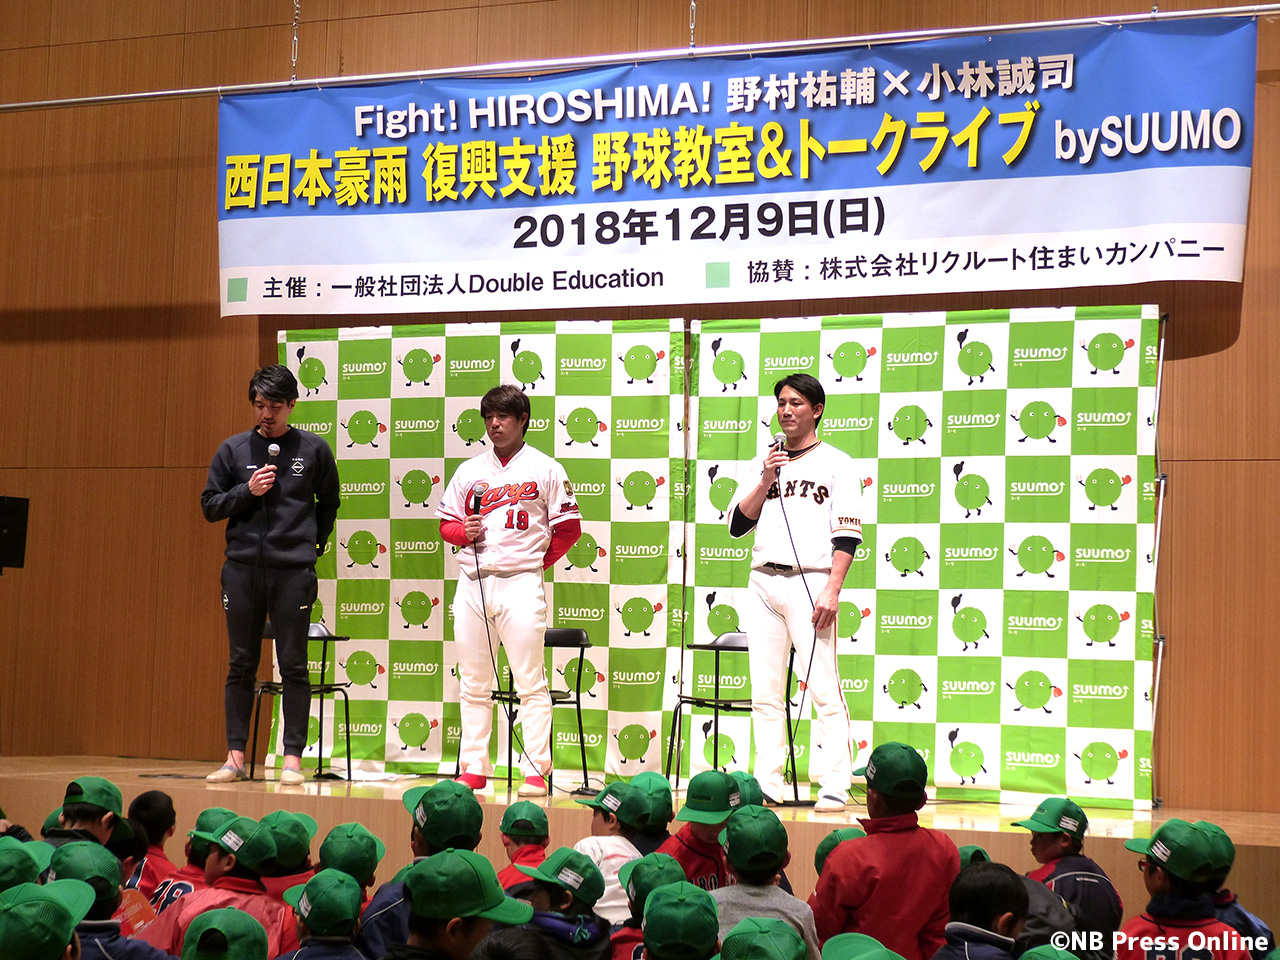 Fight! HIROSHIMA!野村祐輔×小林誠司 西日本豪雨 復興支援 野球教室&トークライブ by SUUMO